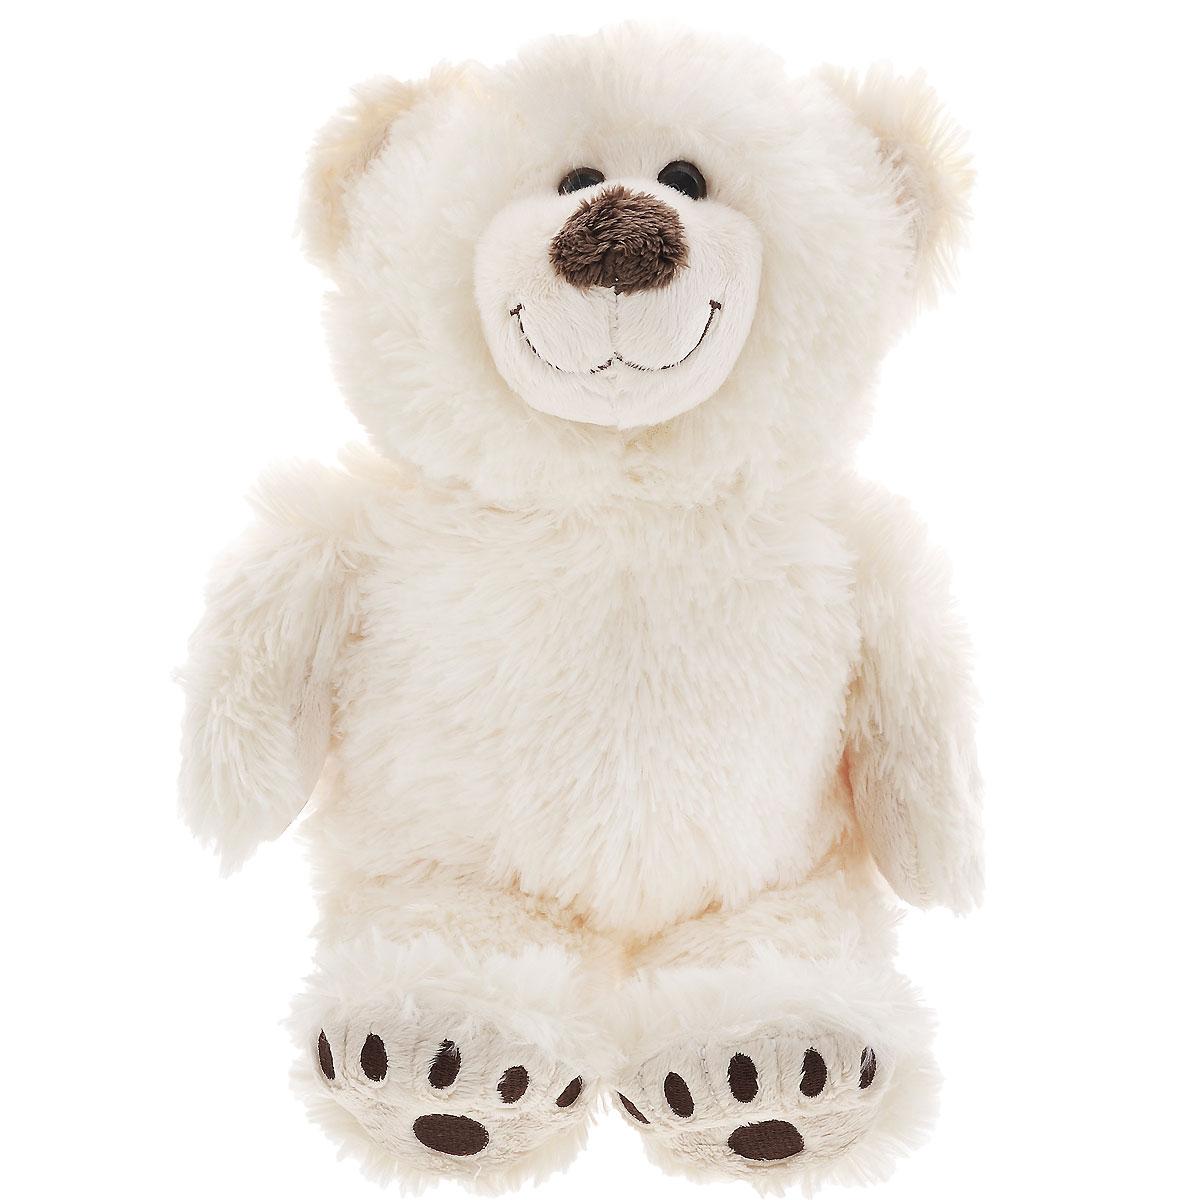 Plush Apple Мягкая игрушка Медведь Аркаша, 44 см